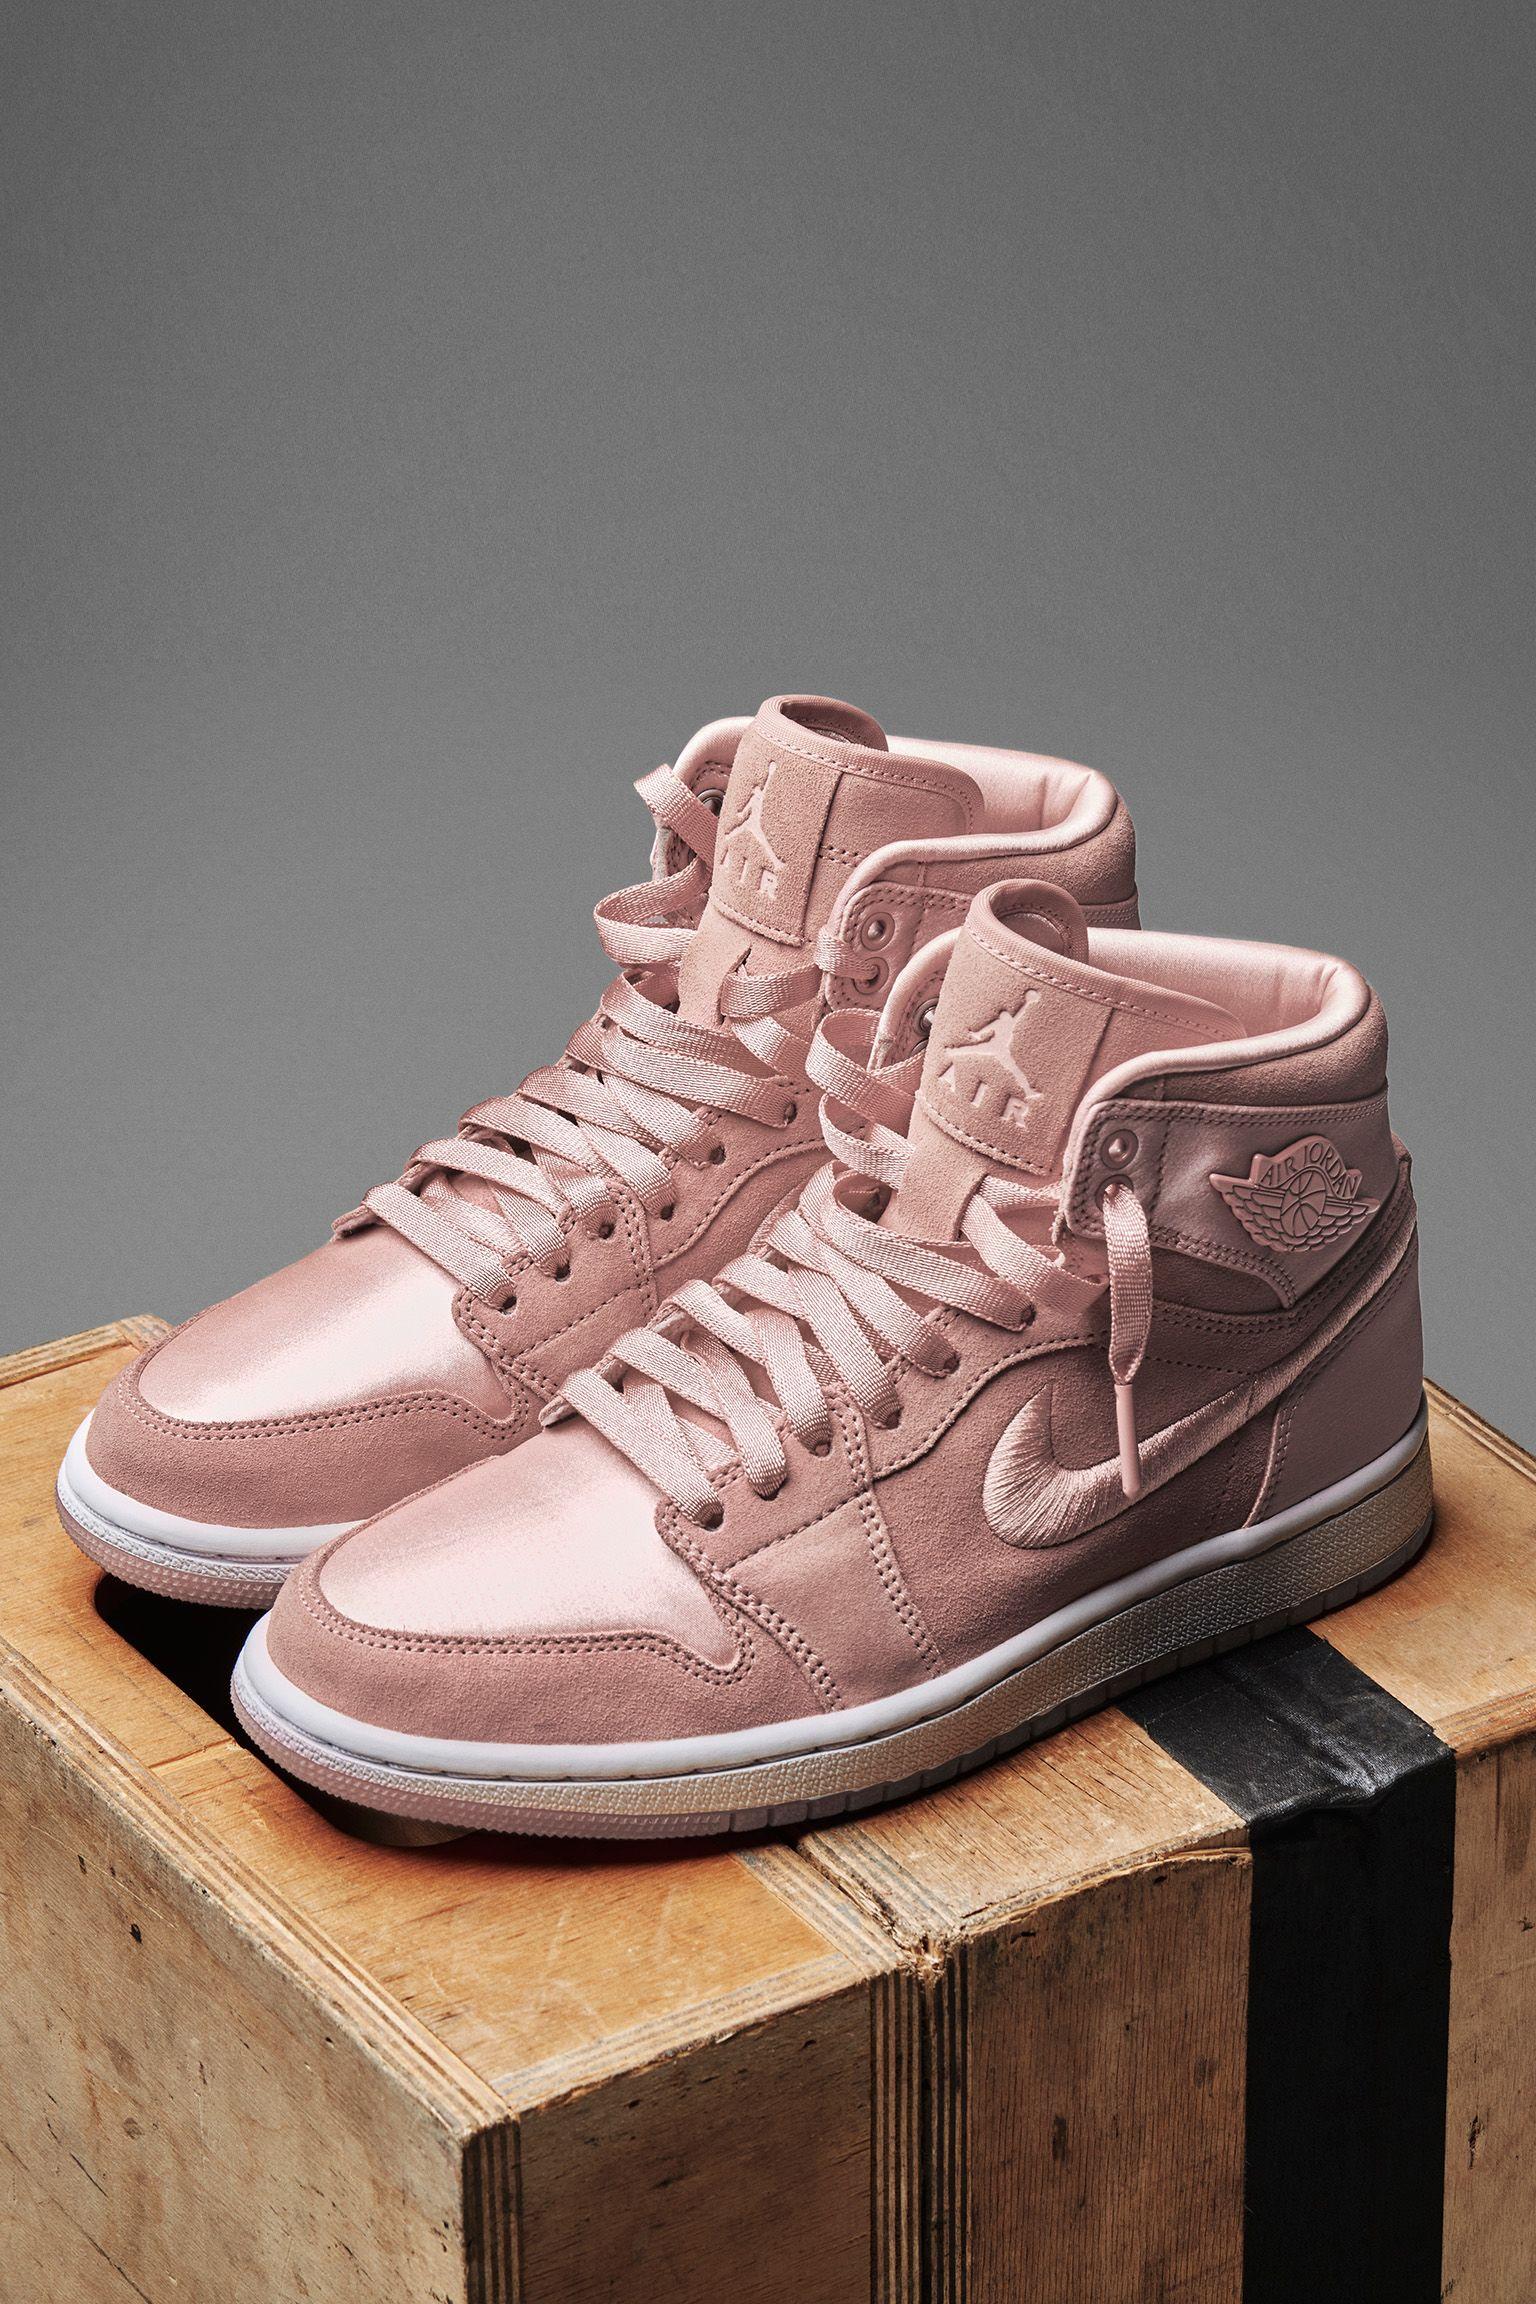 Women s Air Jordan 1 Retro High  Sunset Tint  Release Date. Nike+ SNKRS 0e3f0368c4